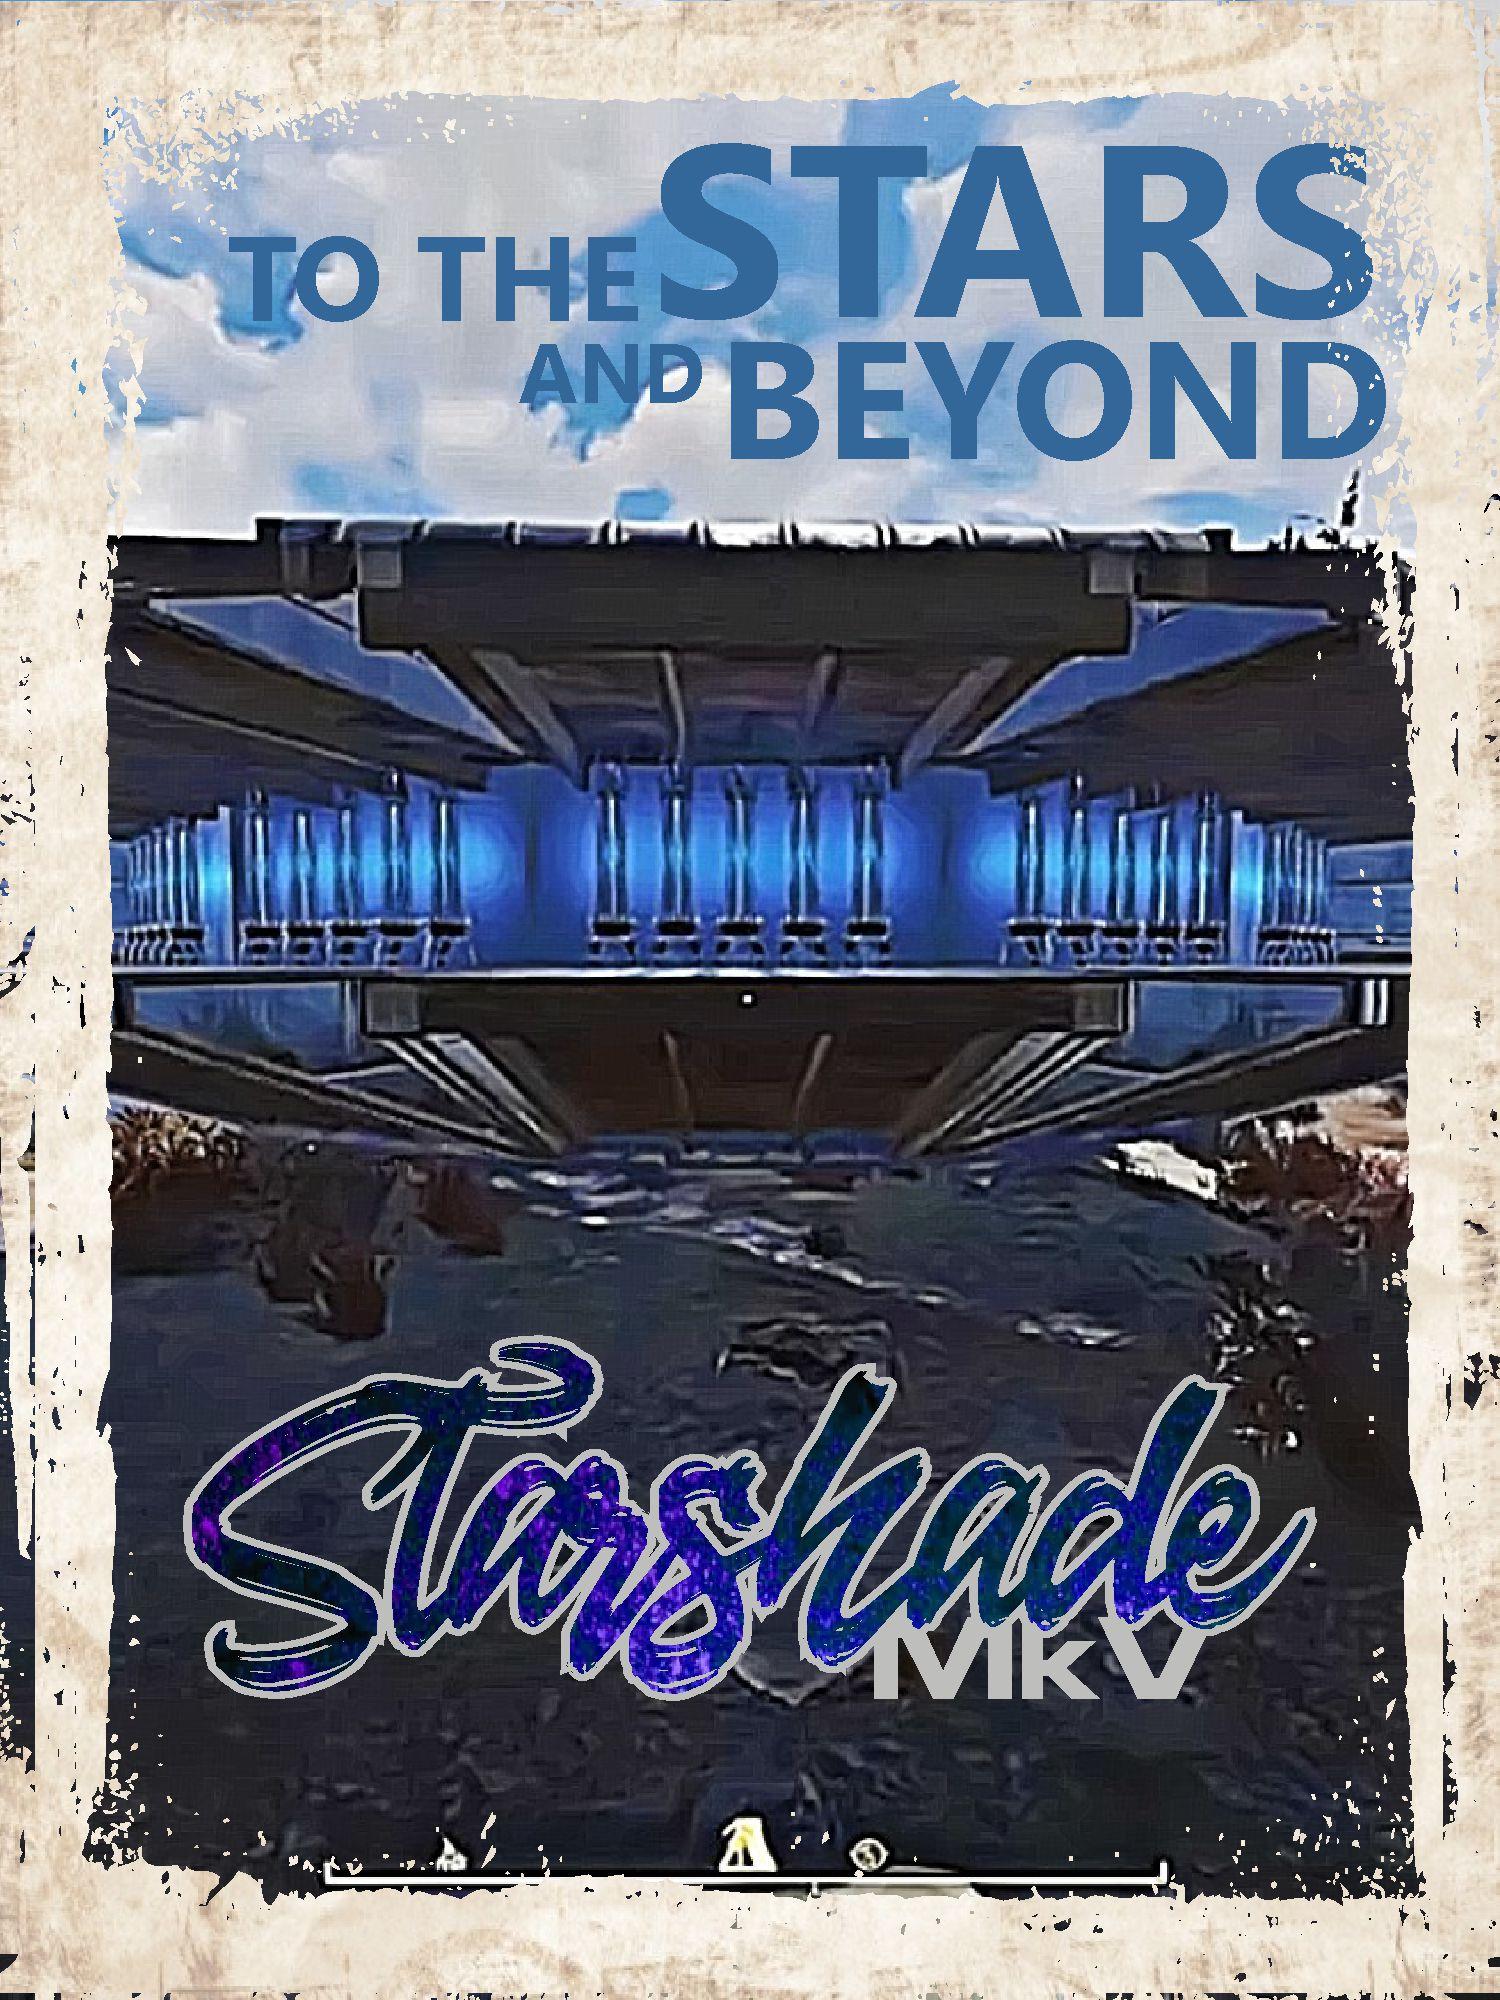 Starshade MkV